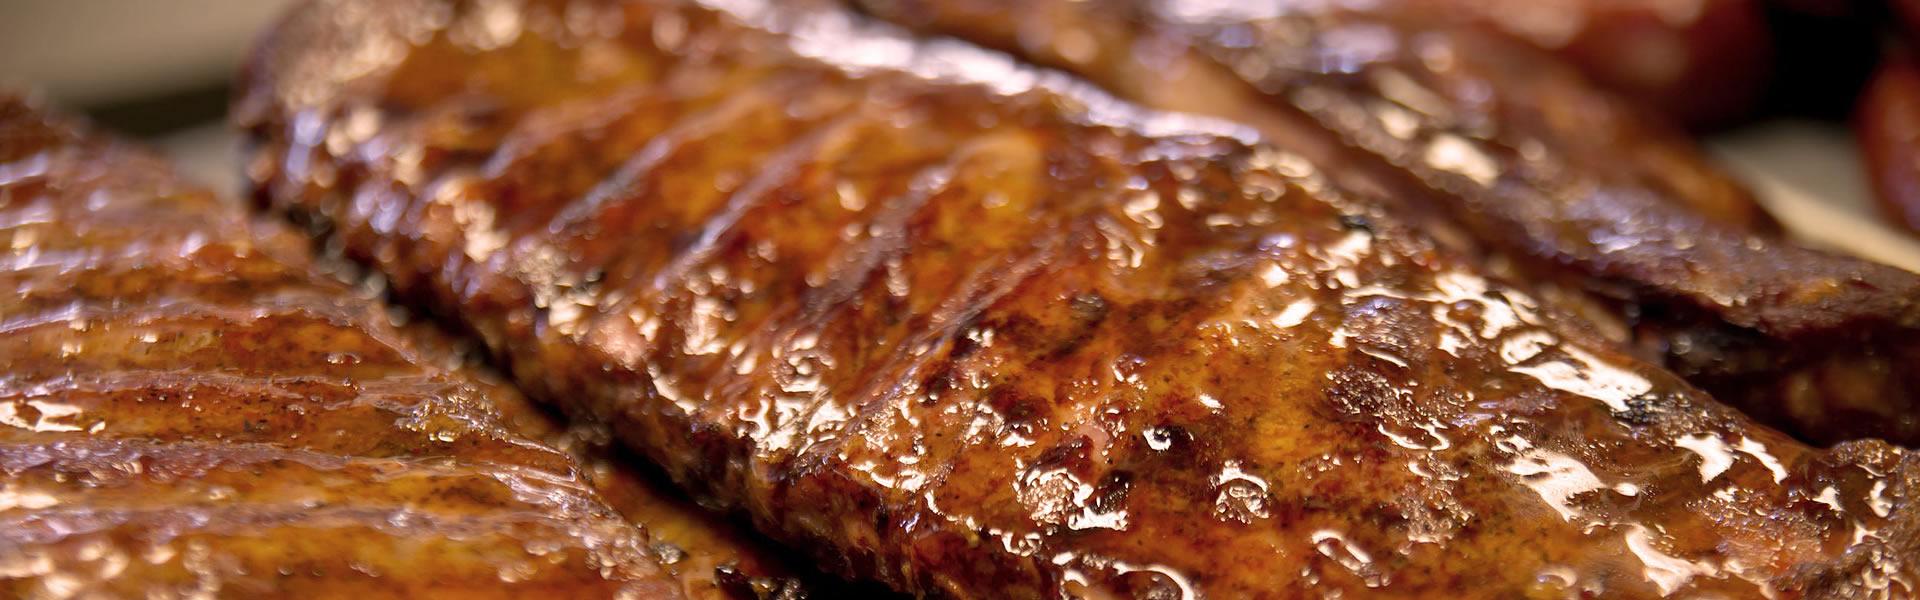 Texas Pit Stop BBQ, Galveston TX